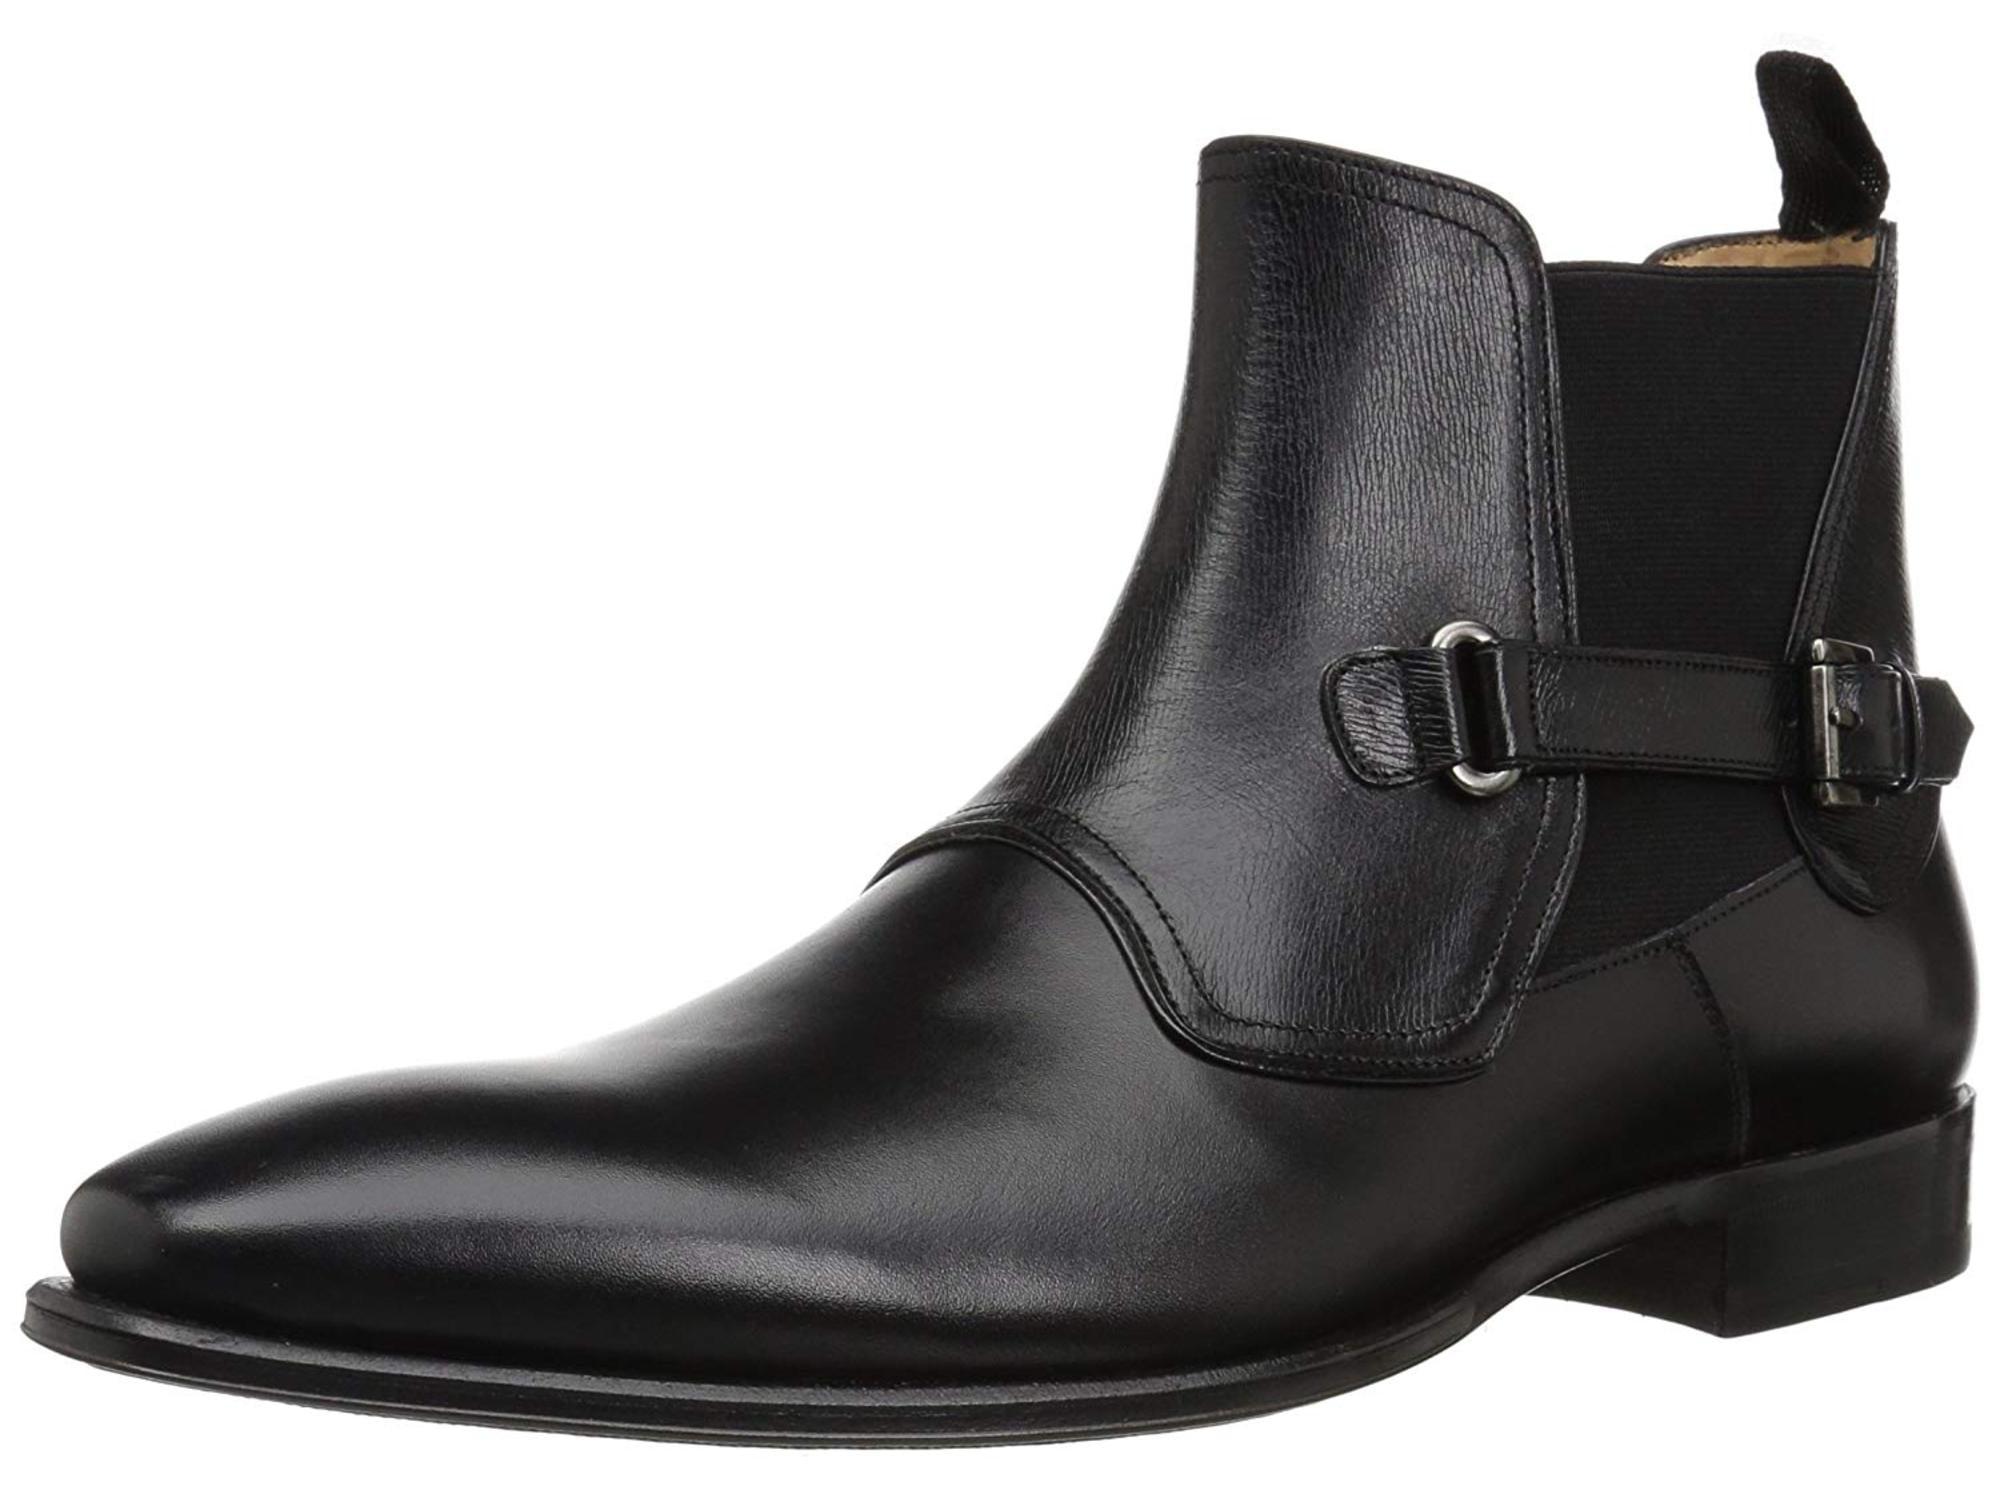 Mezlan Men's Montilla Chelsea Boot, Black, Size 11.0 by Mezlan